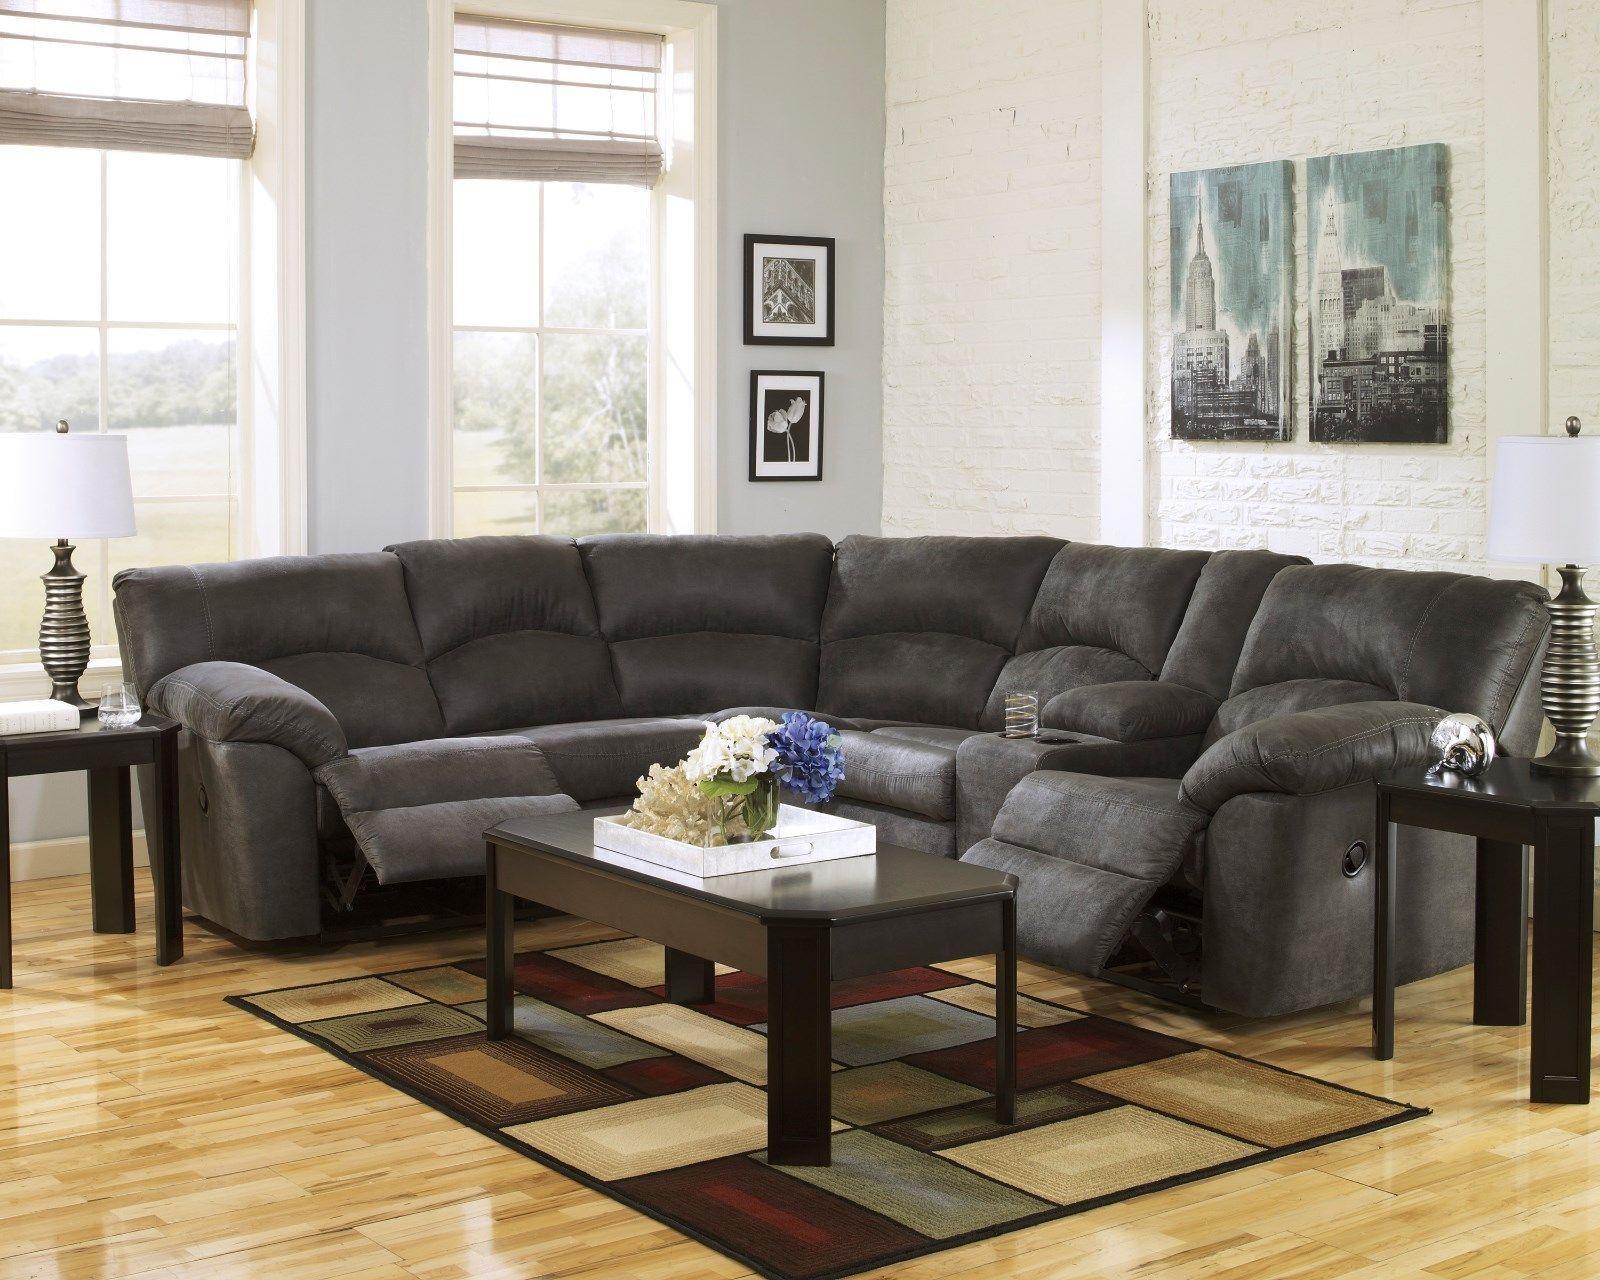 Phenomenal Ashley Furniture Tambo Pewter 2 Piece Reclining Sectional Download Free Architecture Designs Fluibritishbridgeorg